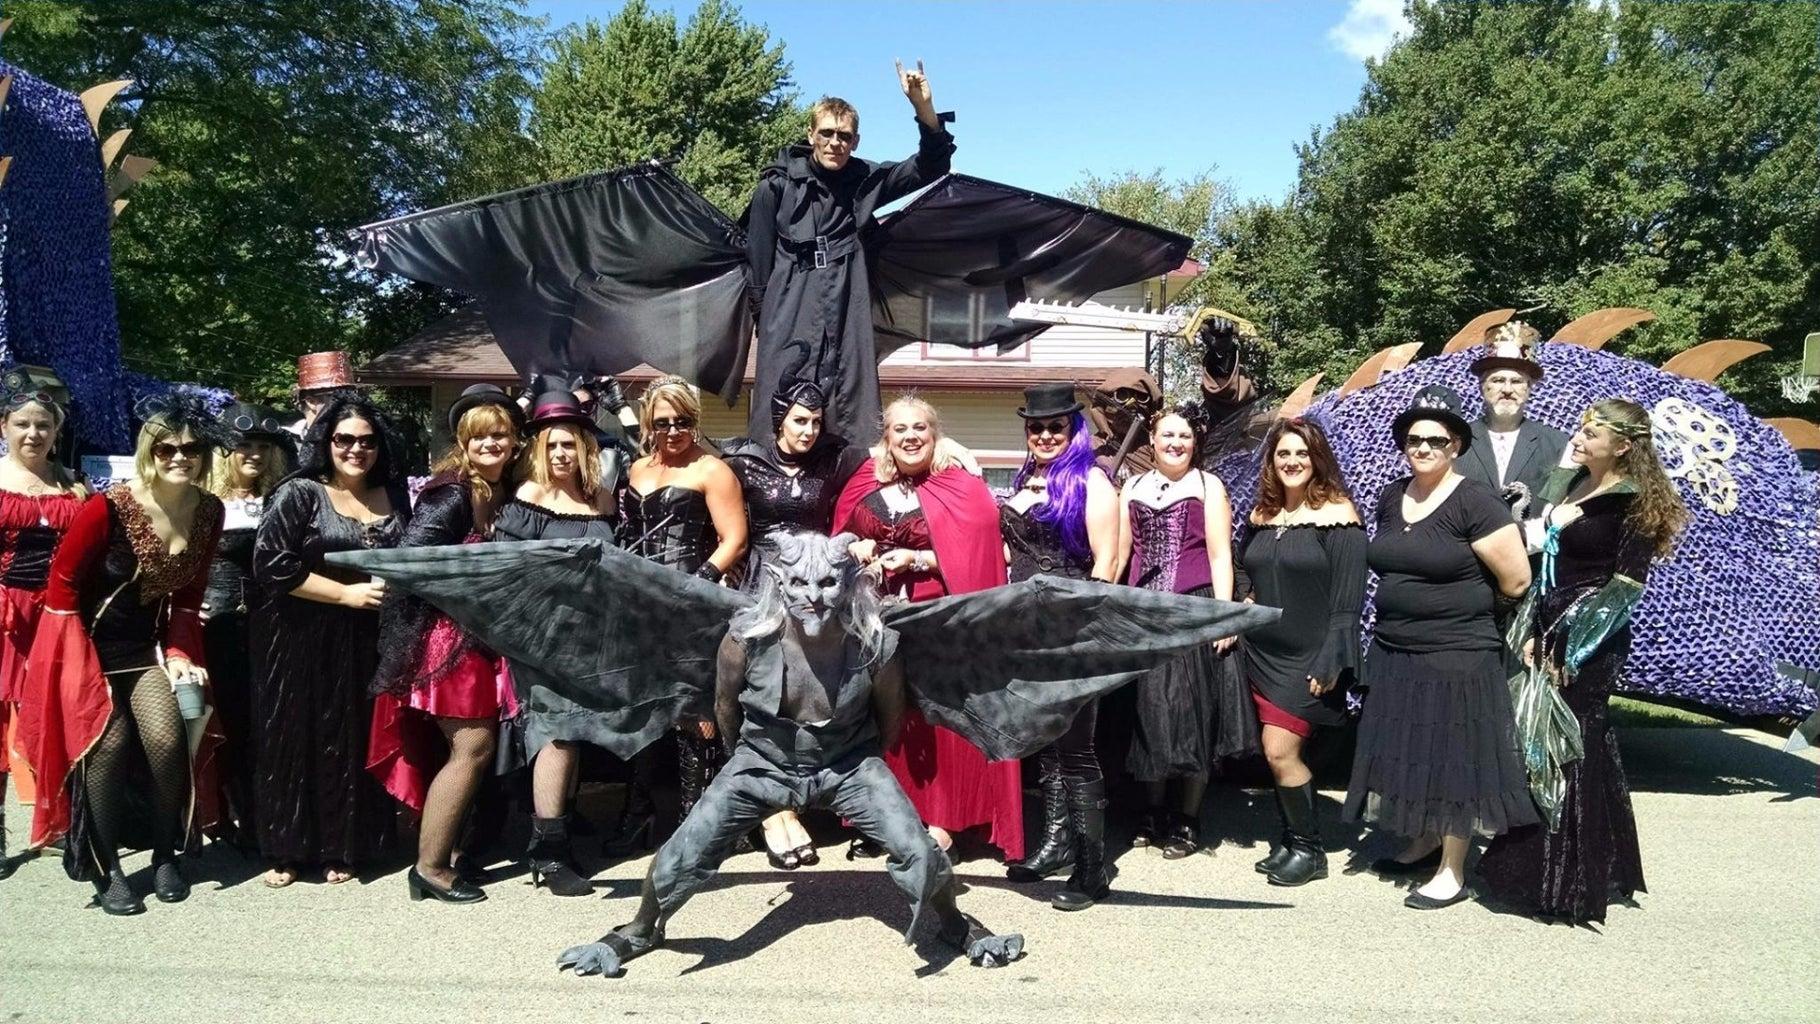 Gargoyle and Wings